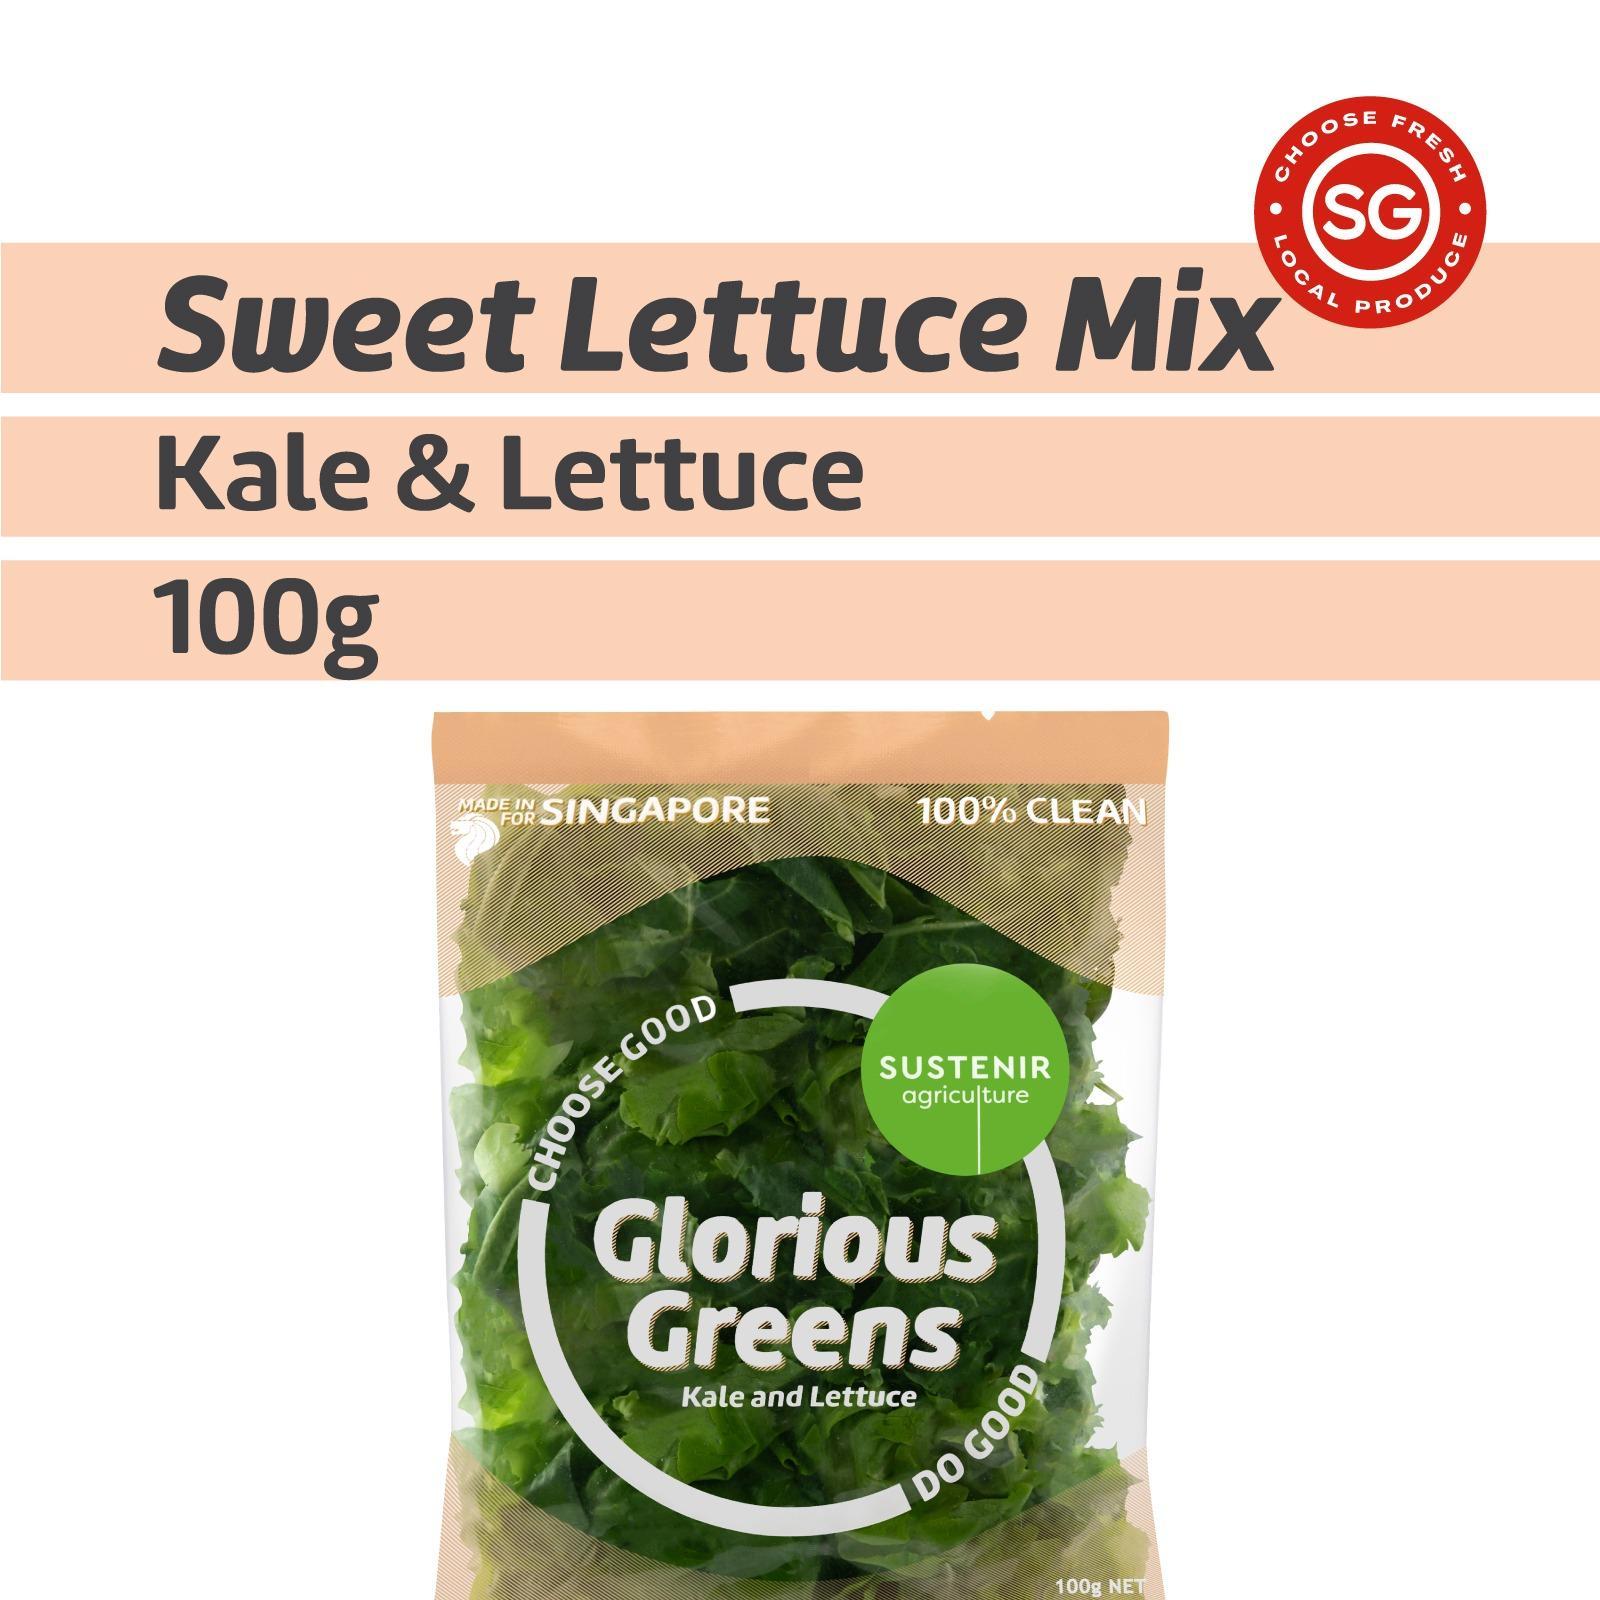 Sustenir Agriculture Glorious Greens Salad